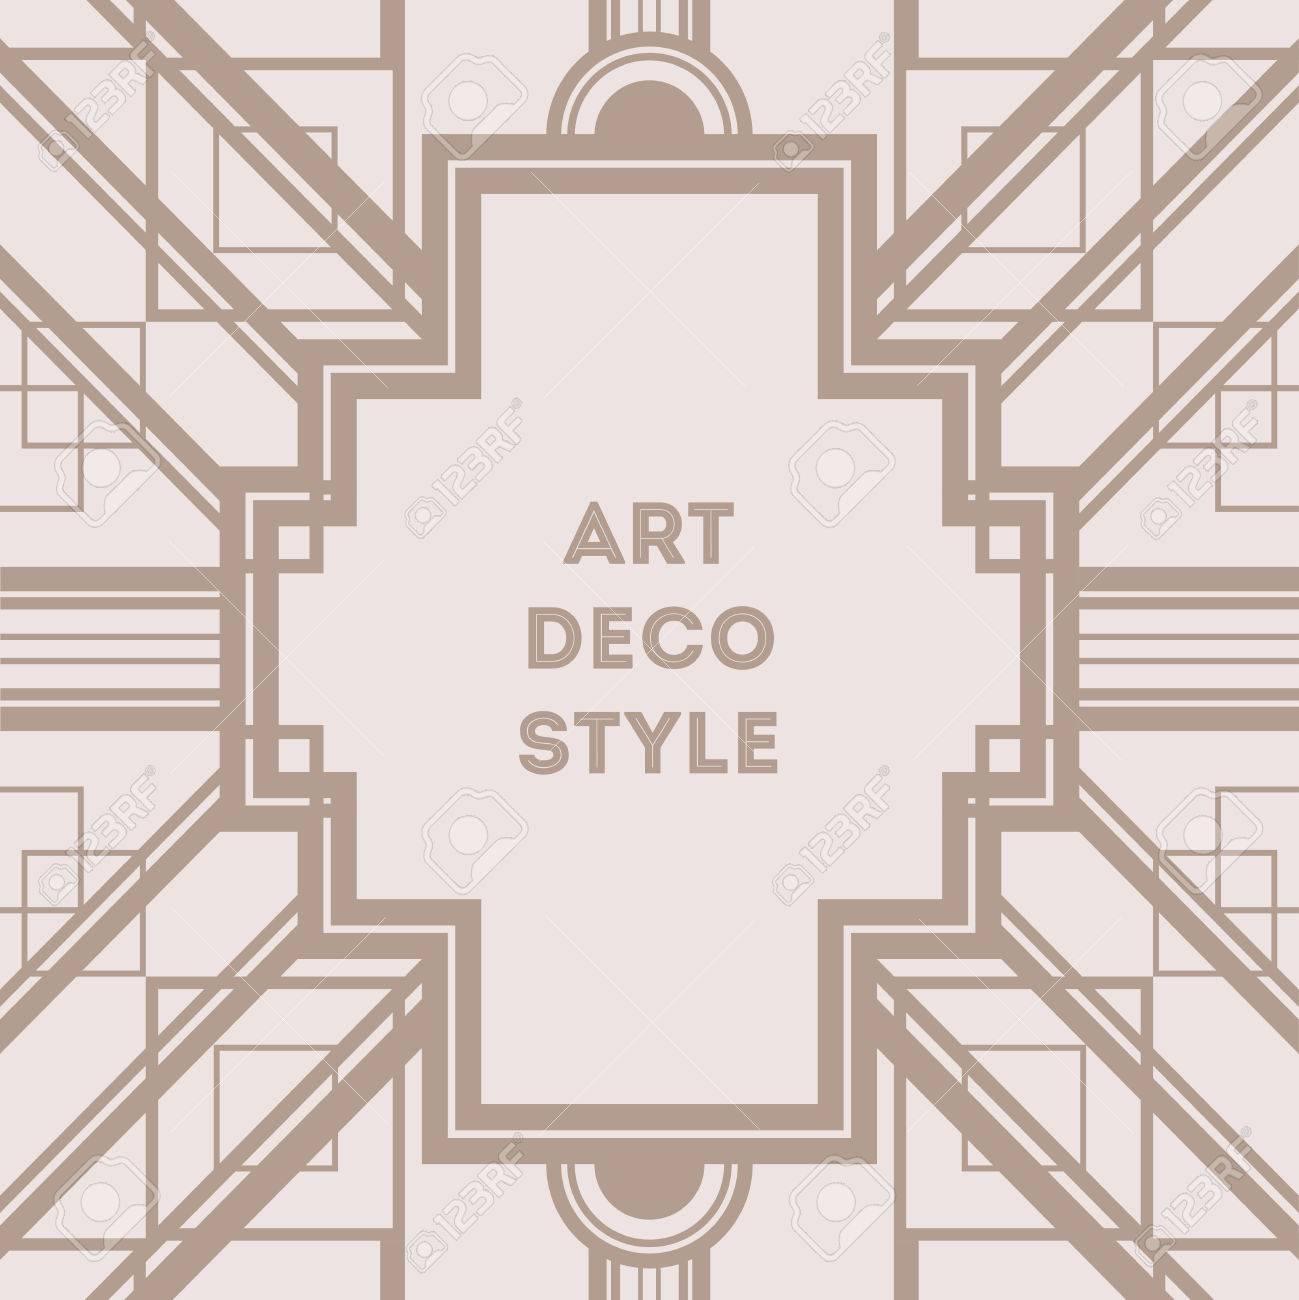 Art Deco Vintage Decorative Frame Retro Card Design Vector Template